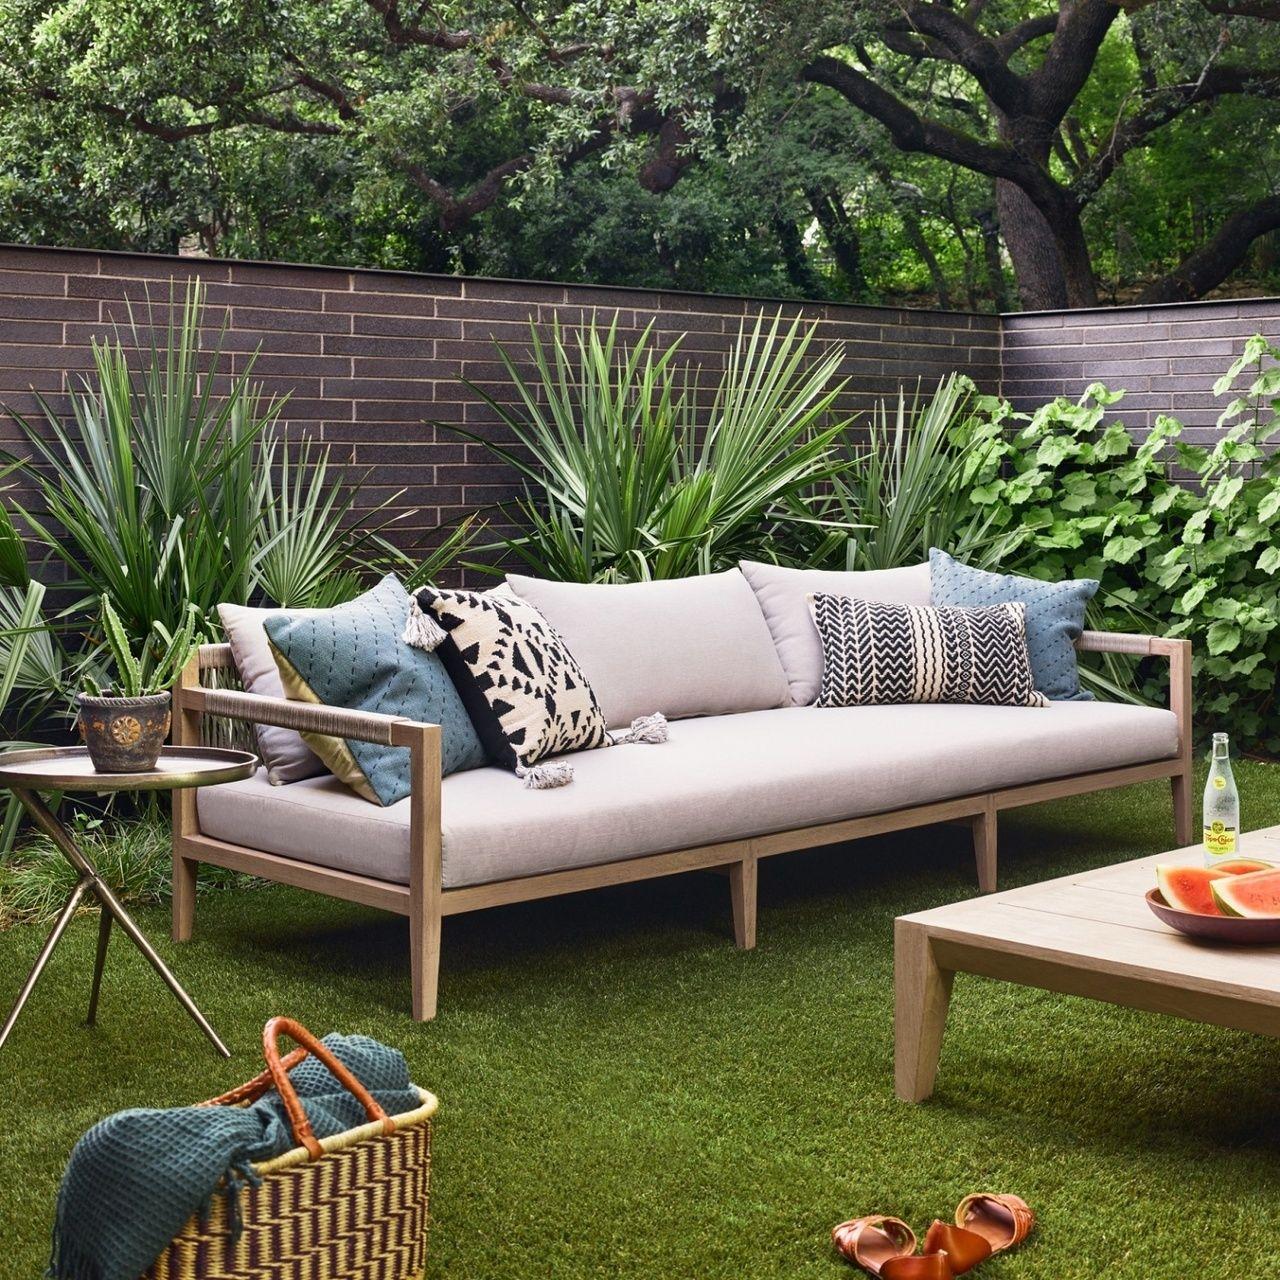 Sherwood Natural Teak Outdoor 3 Seater Sofa 93 Teak Patio Furniture Backyard Furniture Resin Patio Furniture